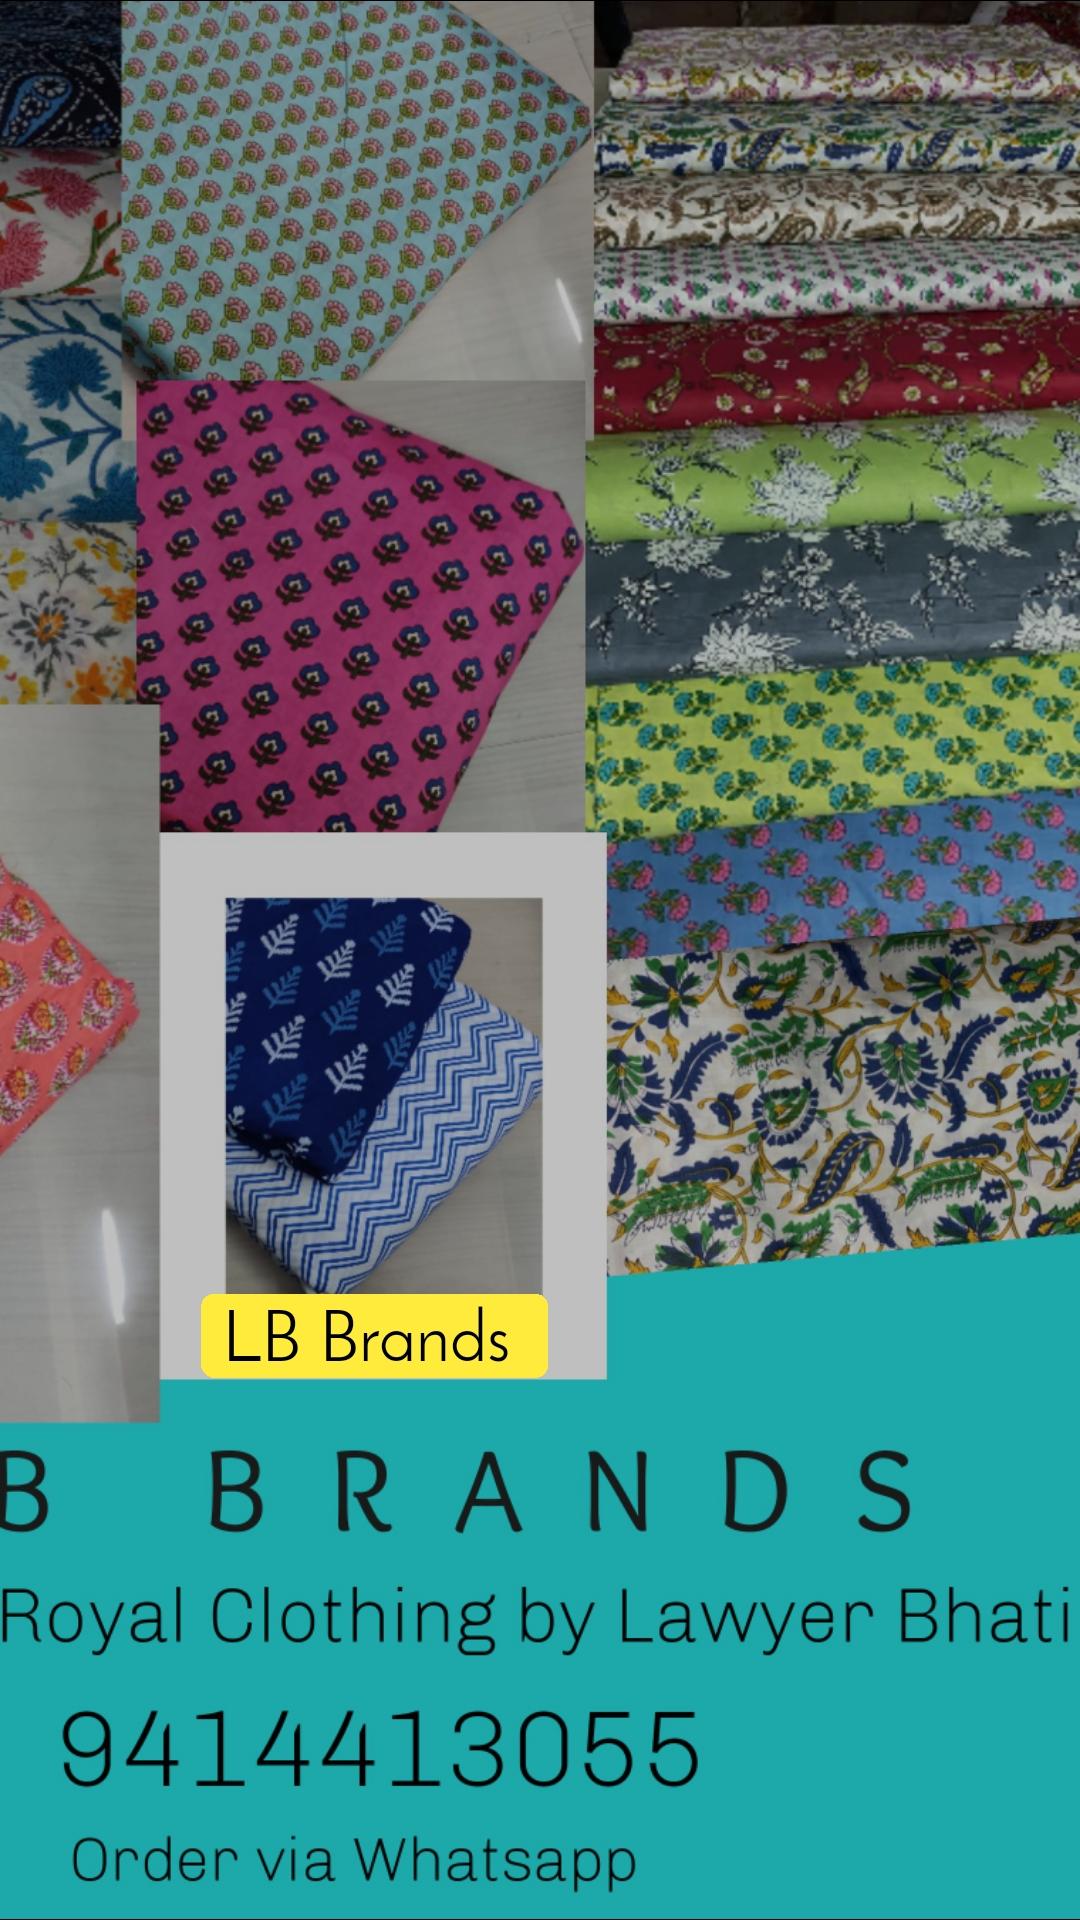 LB Brands